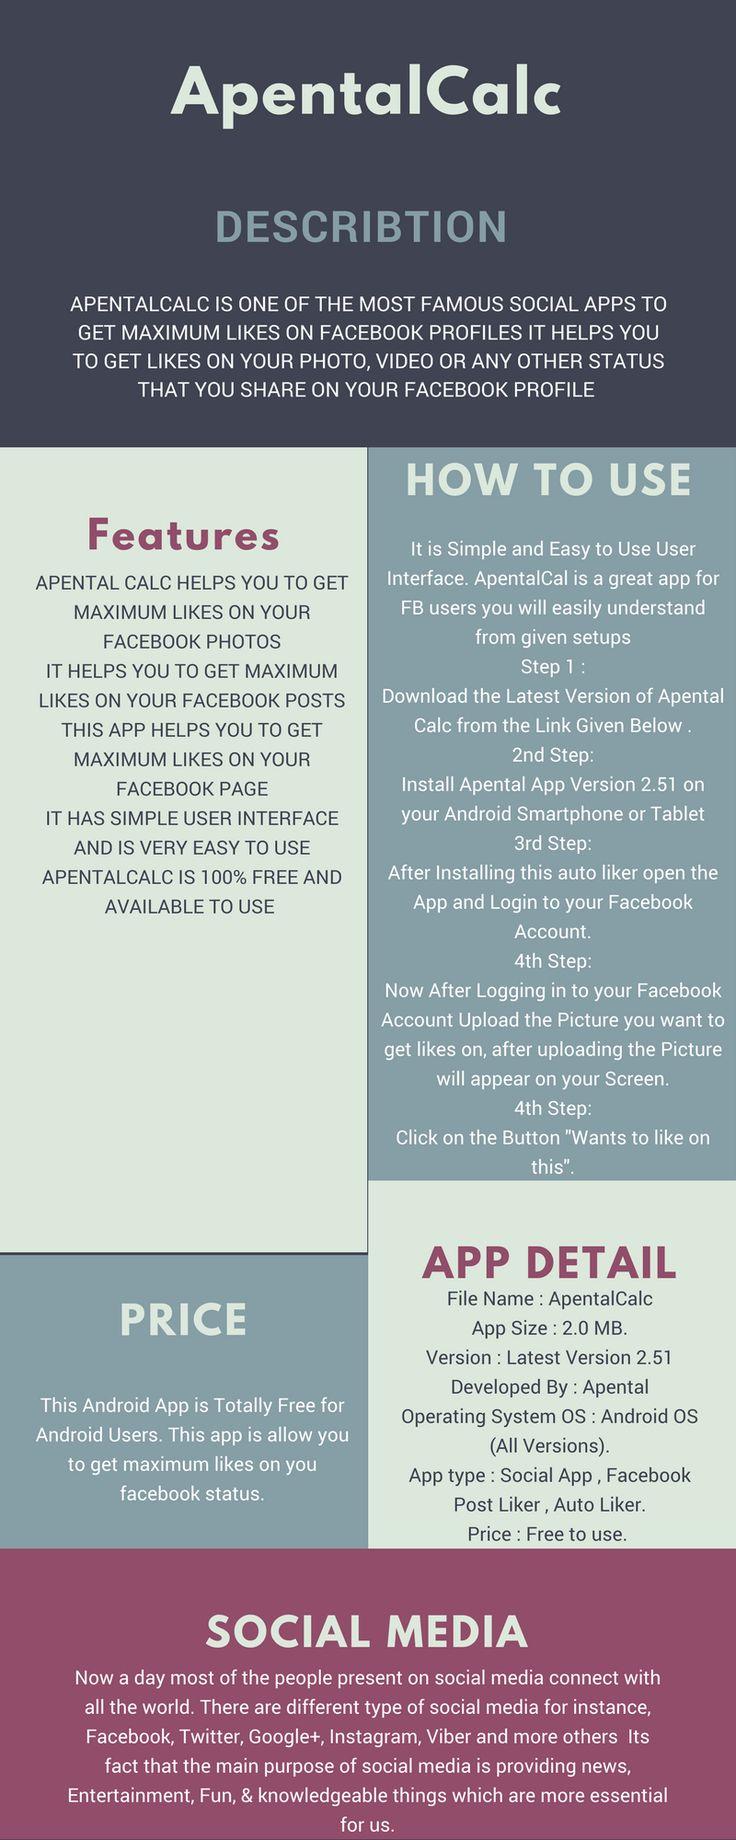 http://www.androidena.com/2017/01/apentalcalc-fb-liker-apk-app-download.html